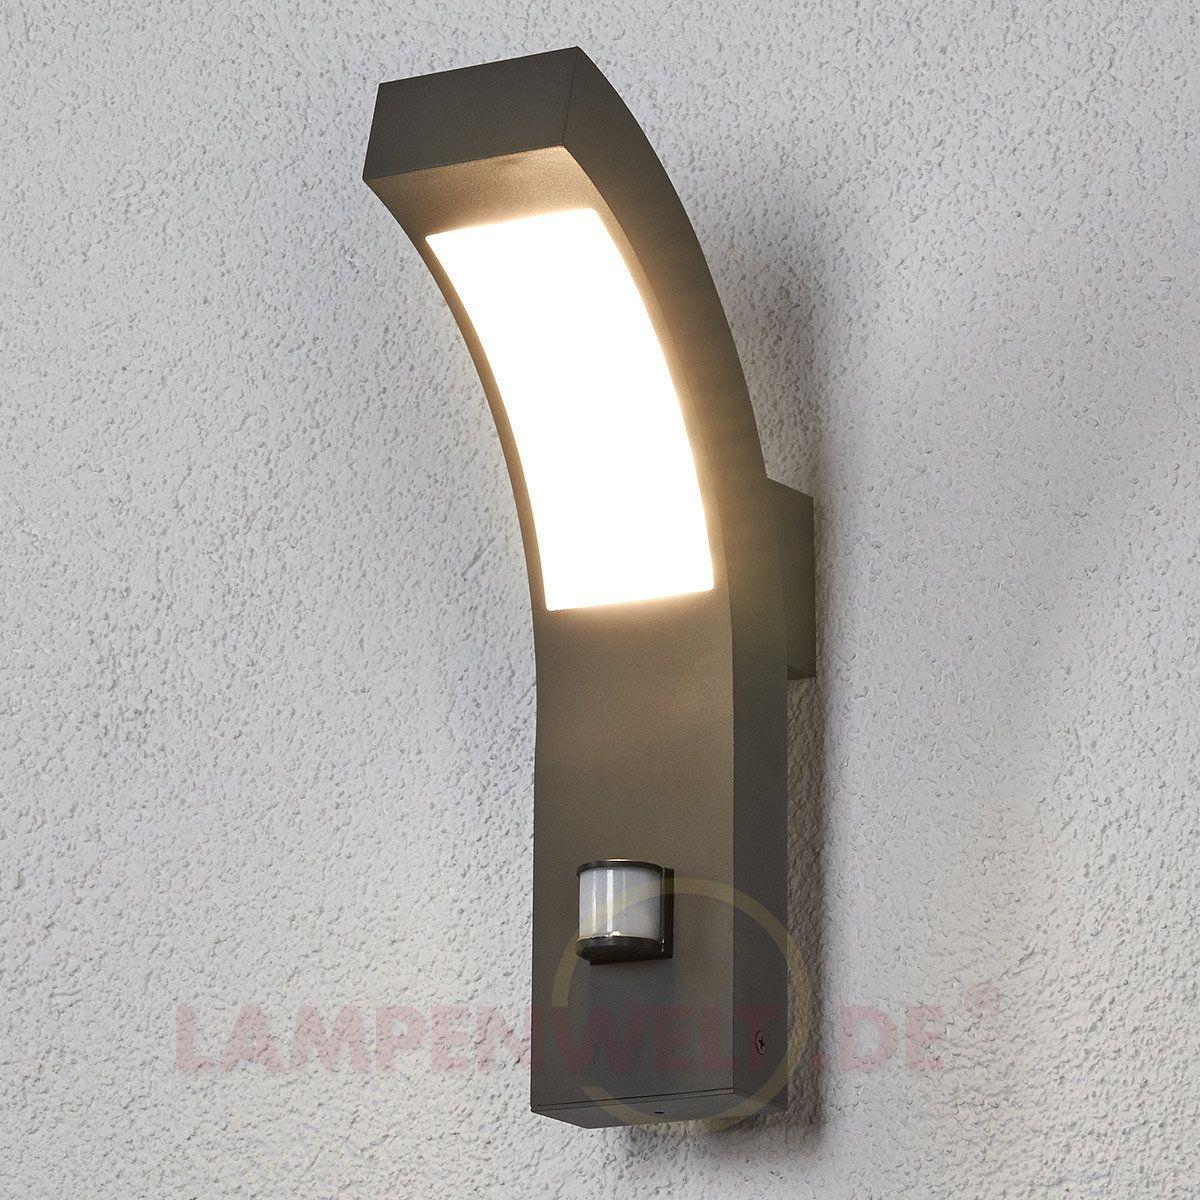 led au enwandleuchte lennik mit bewegungsmelder kaufen lampen pinterest au enwandleuchte. Black Bedroom Furniture Sets. Home Design Ideas